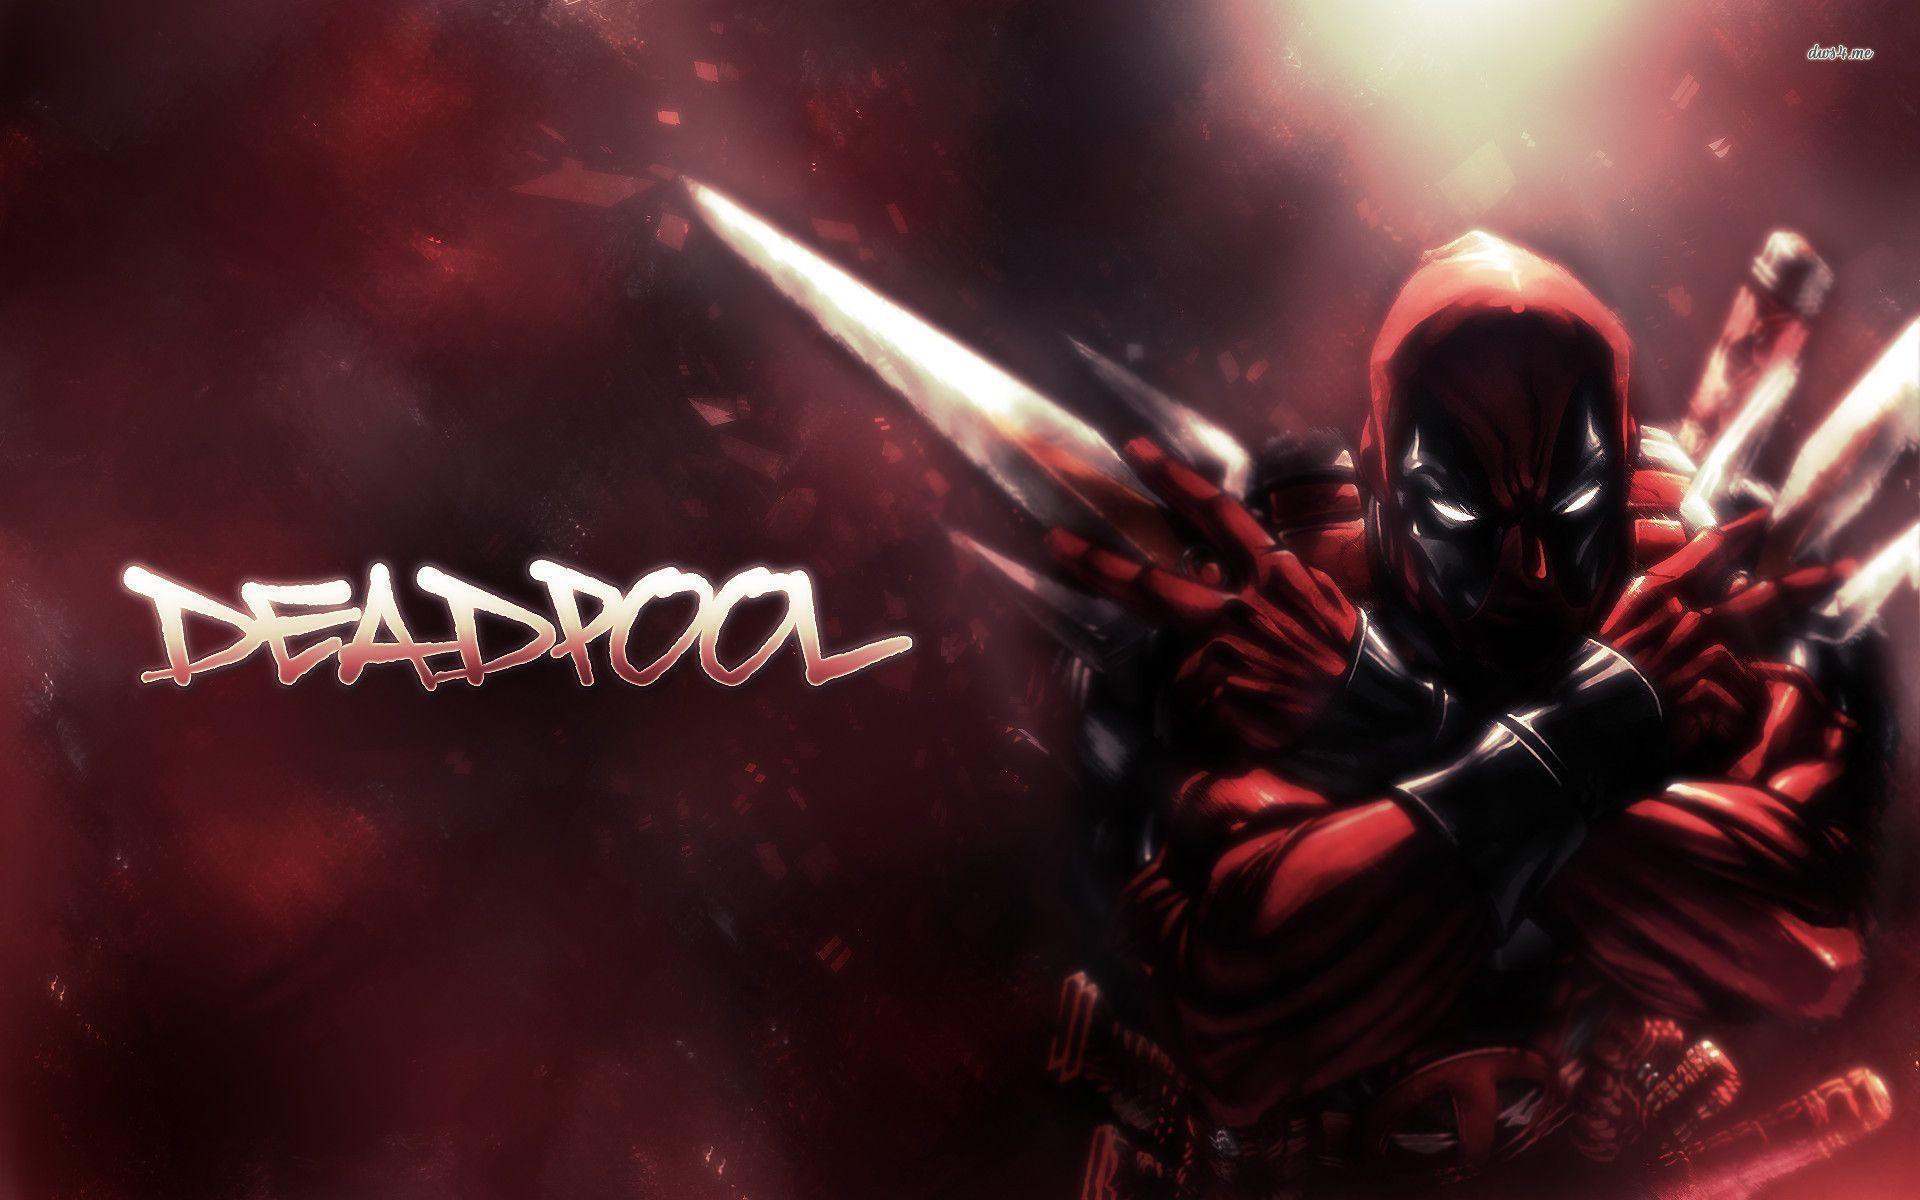 deadpool wallpaper hd 1080p - photo #16